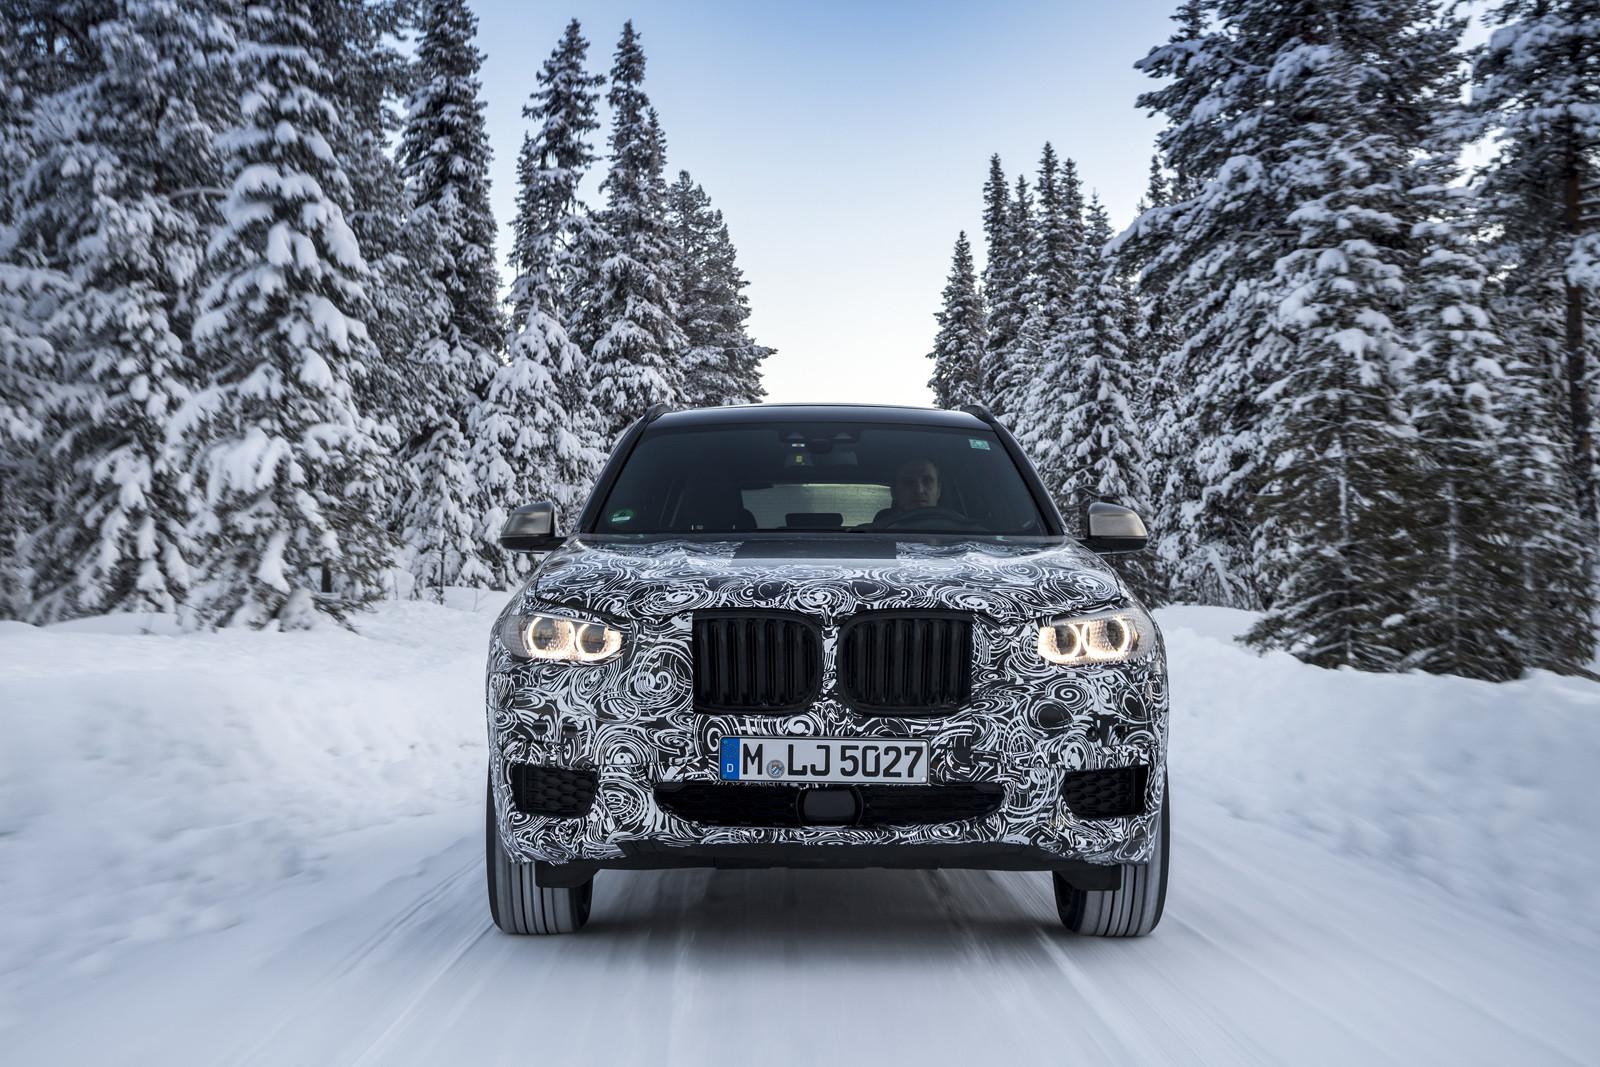 Foto de BMW X3 2018 camuflaje (11/16)